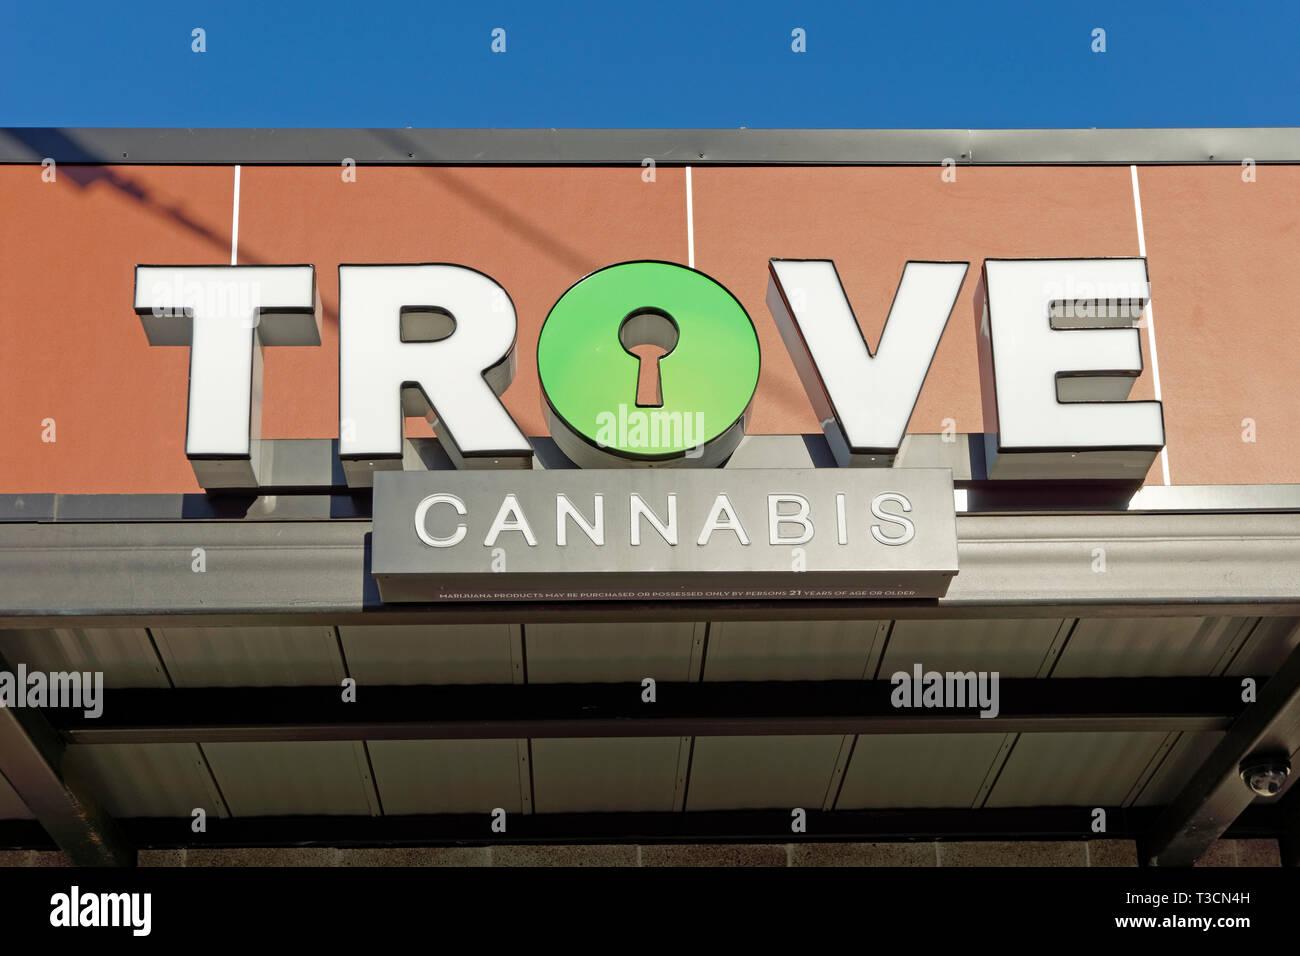 Trove Cannabis recreational and medical marijuana shop sign on Samish Way, Bellingham, Washington state, USA - Stock Image